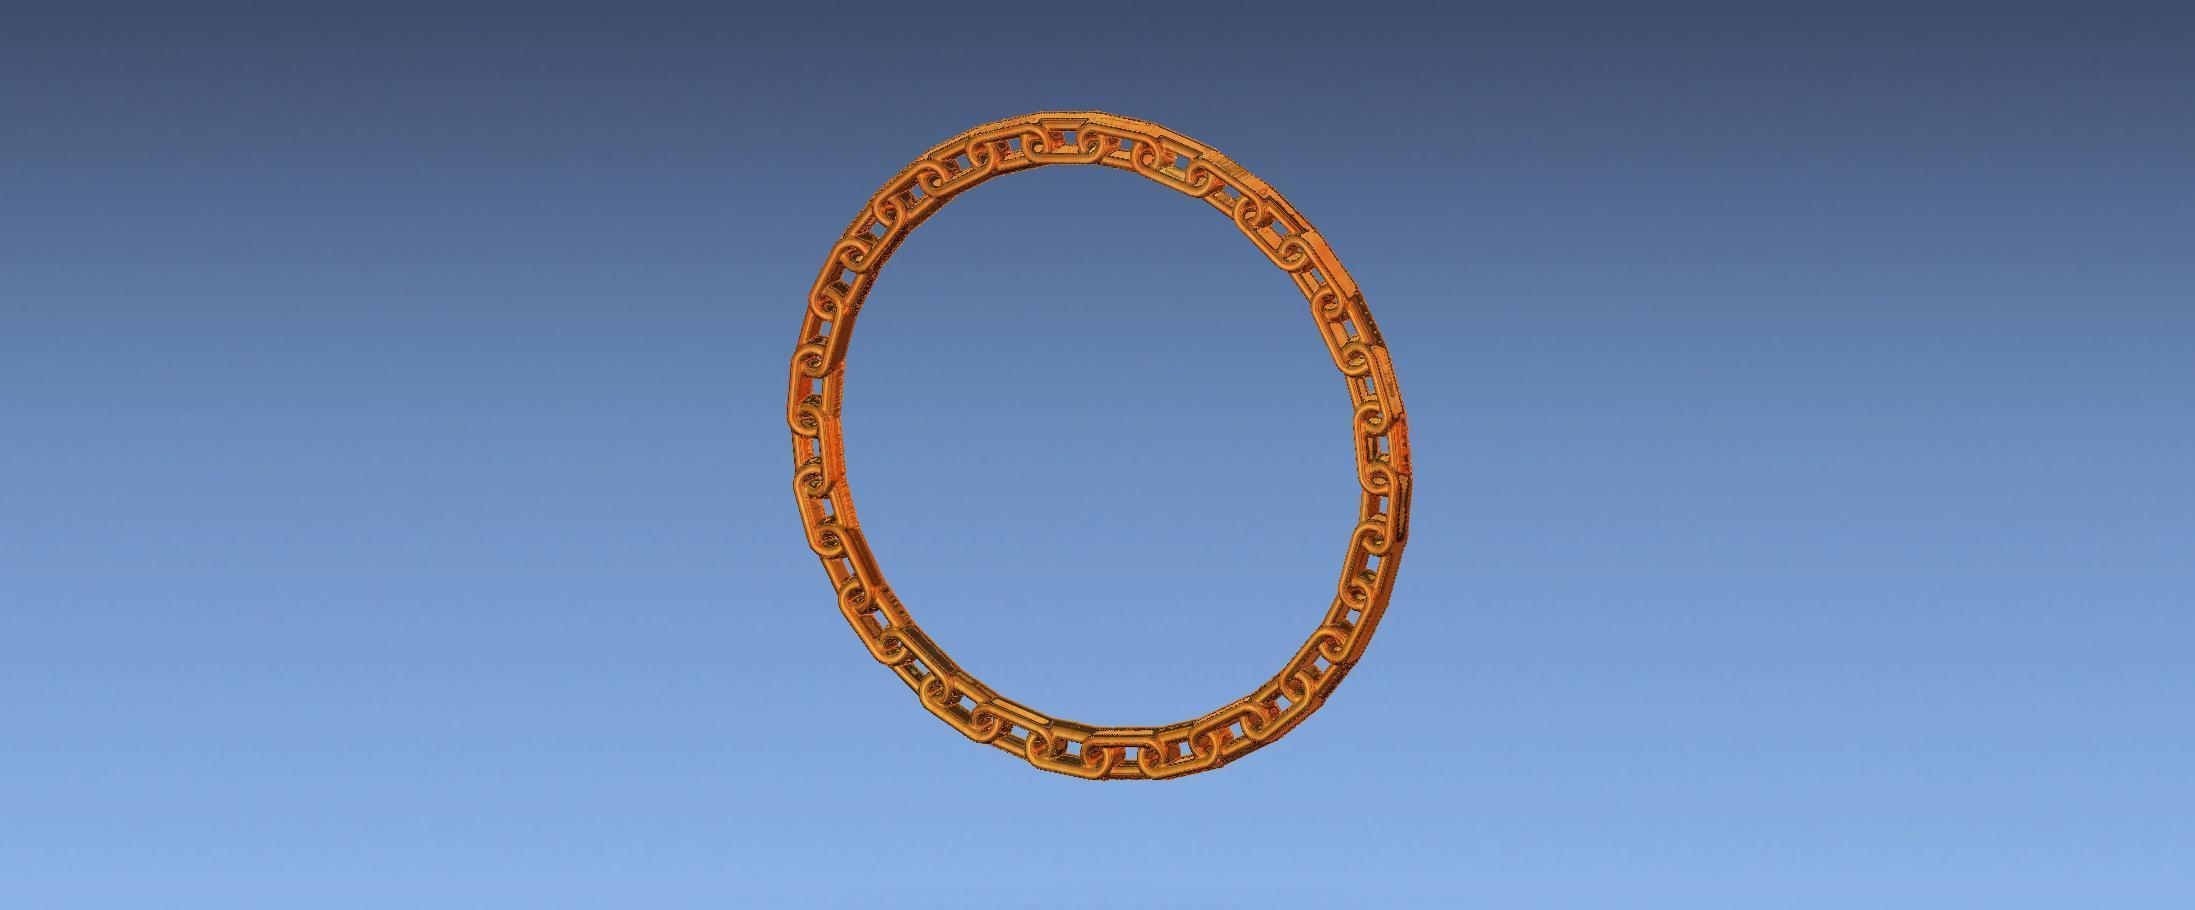 3.jpg Download free STL file chain border 3d stl file • 3D printing design, ALPHA_MENA